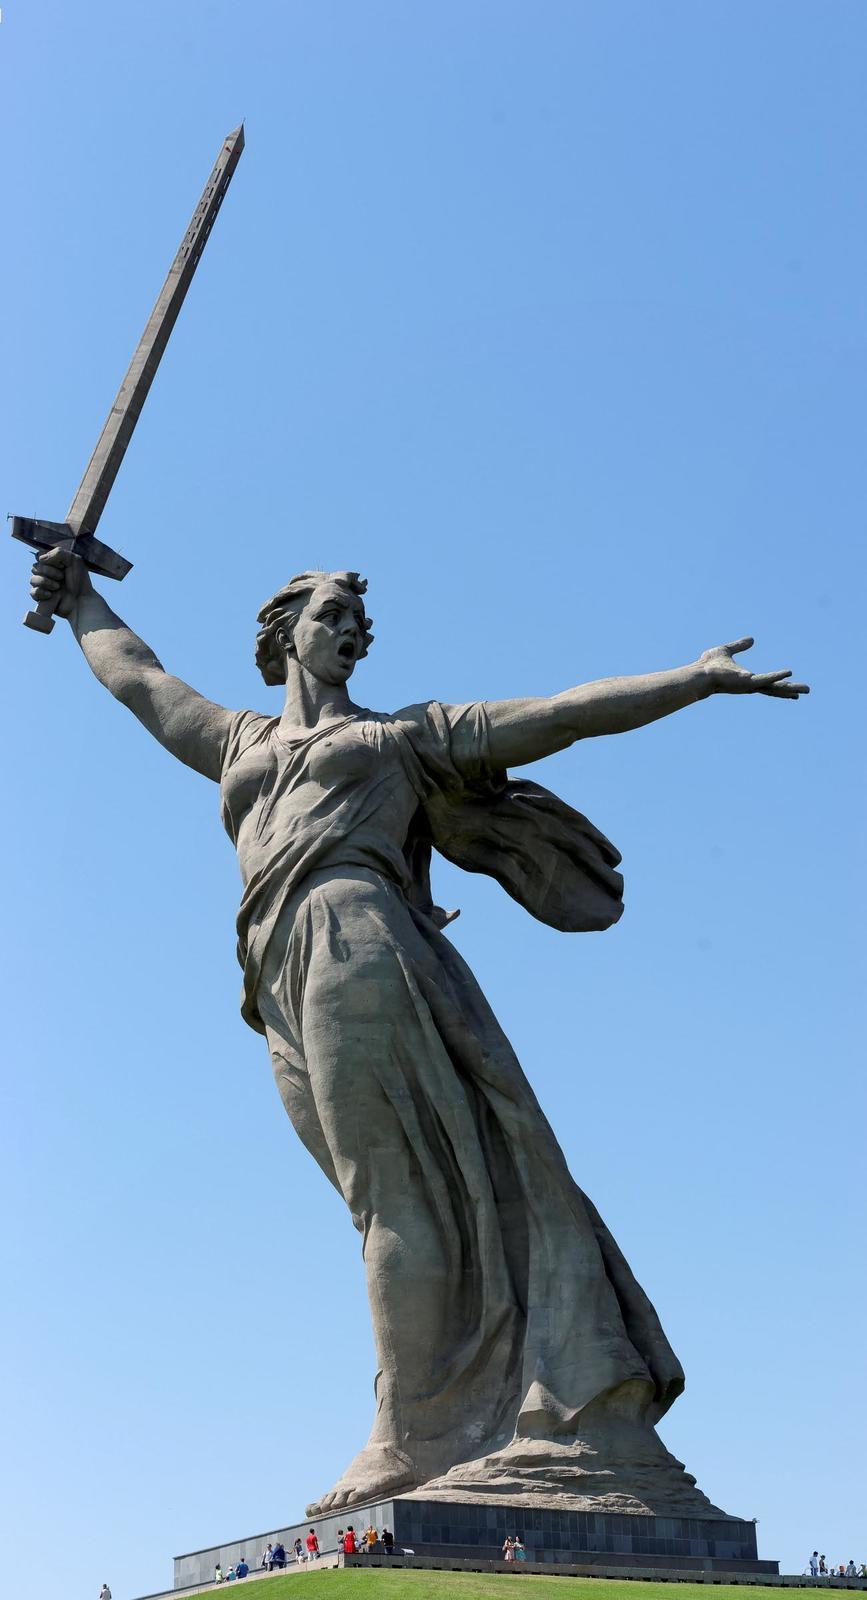 Фото №858253. Скульптура «Родина-мать зовет!»